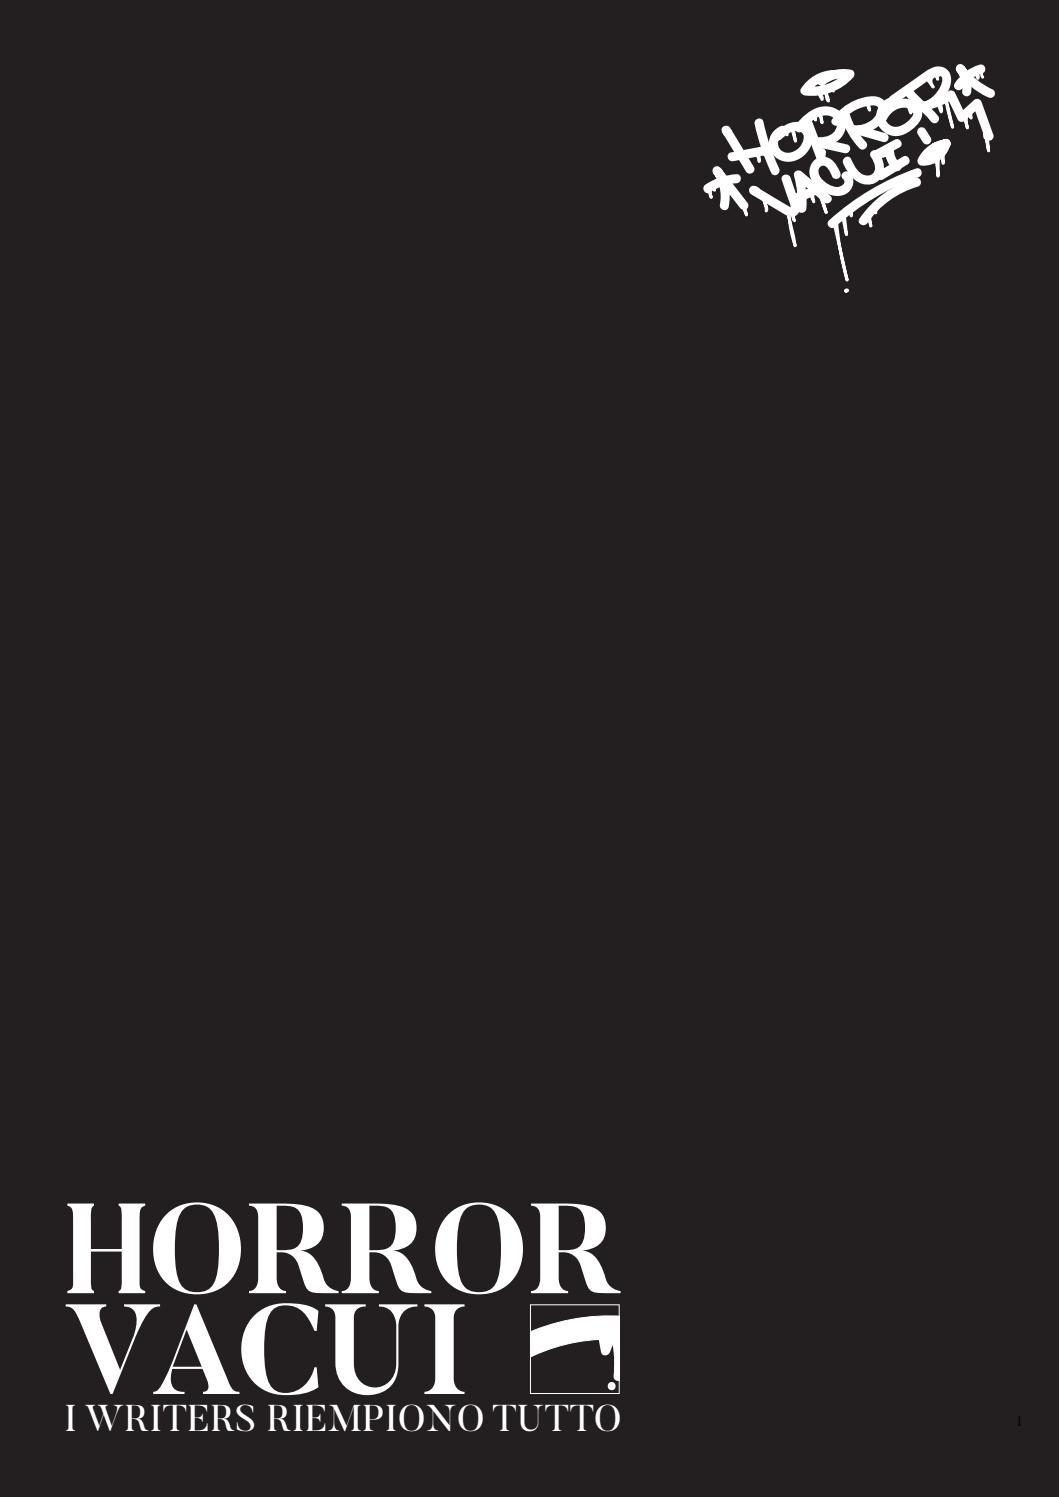 Horror Vacui I Writers Riempiono Tutto By Dino Kapetanovic